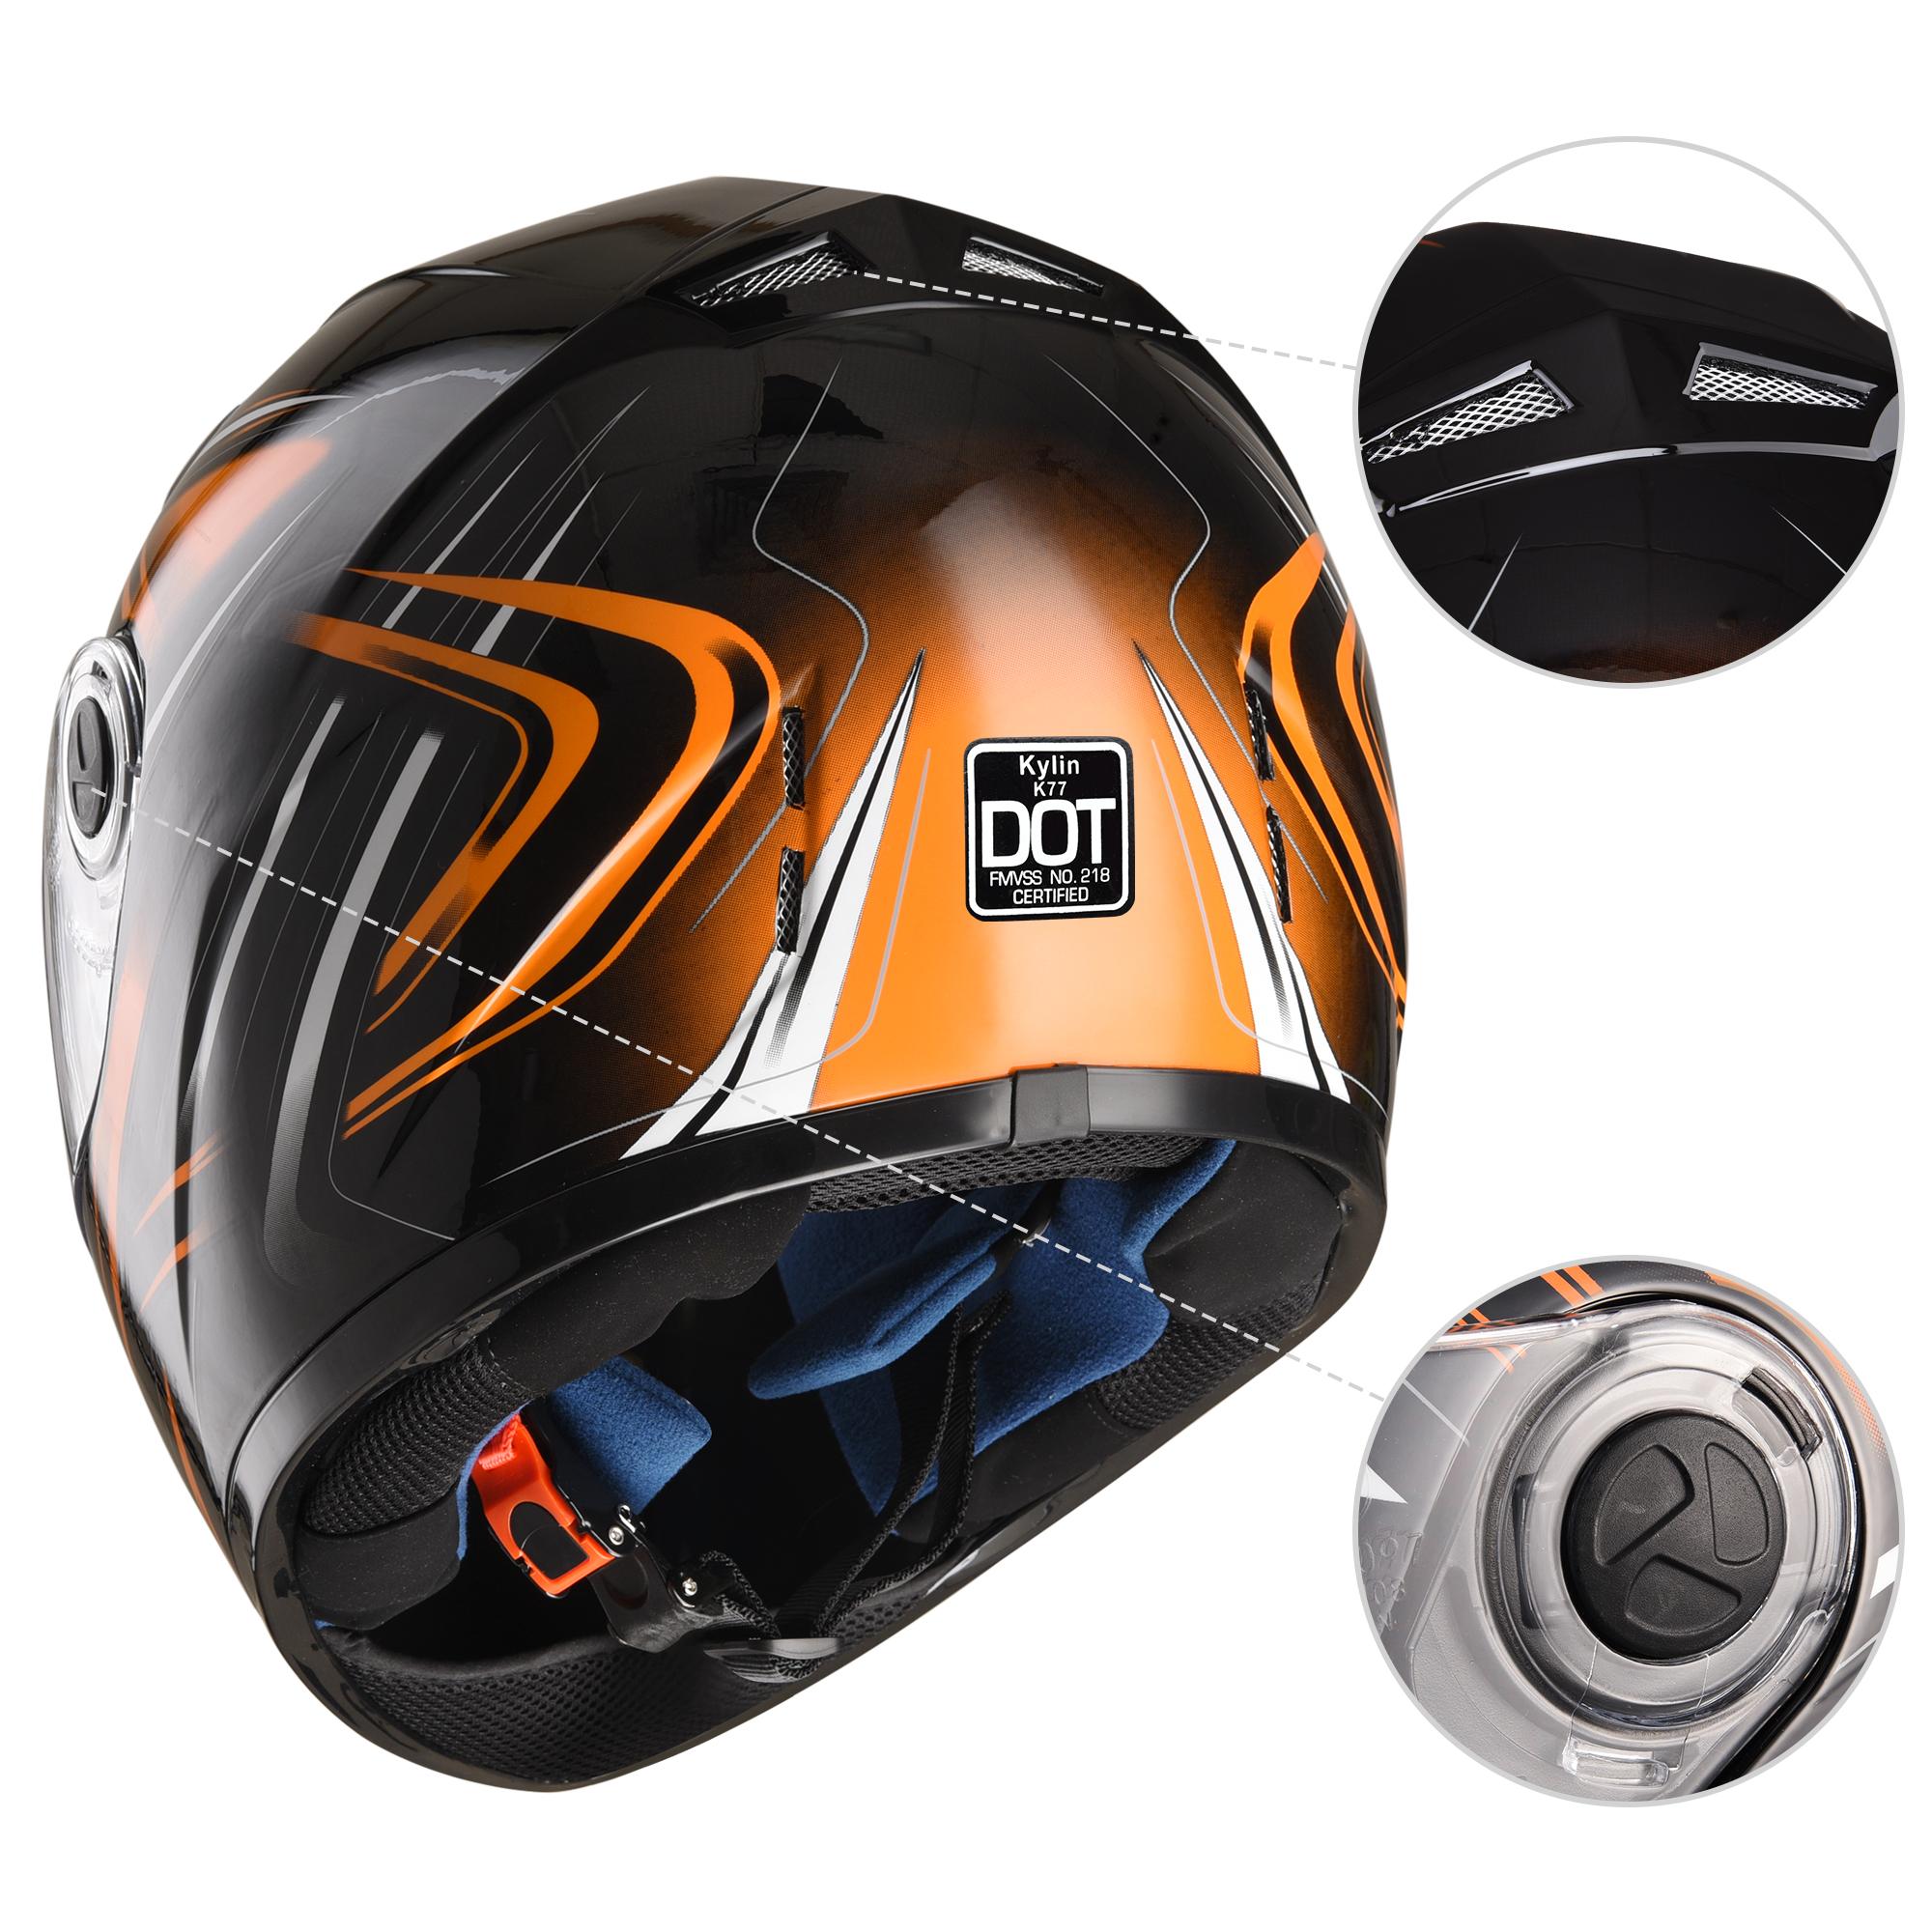 miniature 112 - AHR K12 Full Face Motorcycle Helmet DOT Air Vents Clear Visor Racing S M L XL